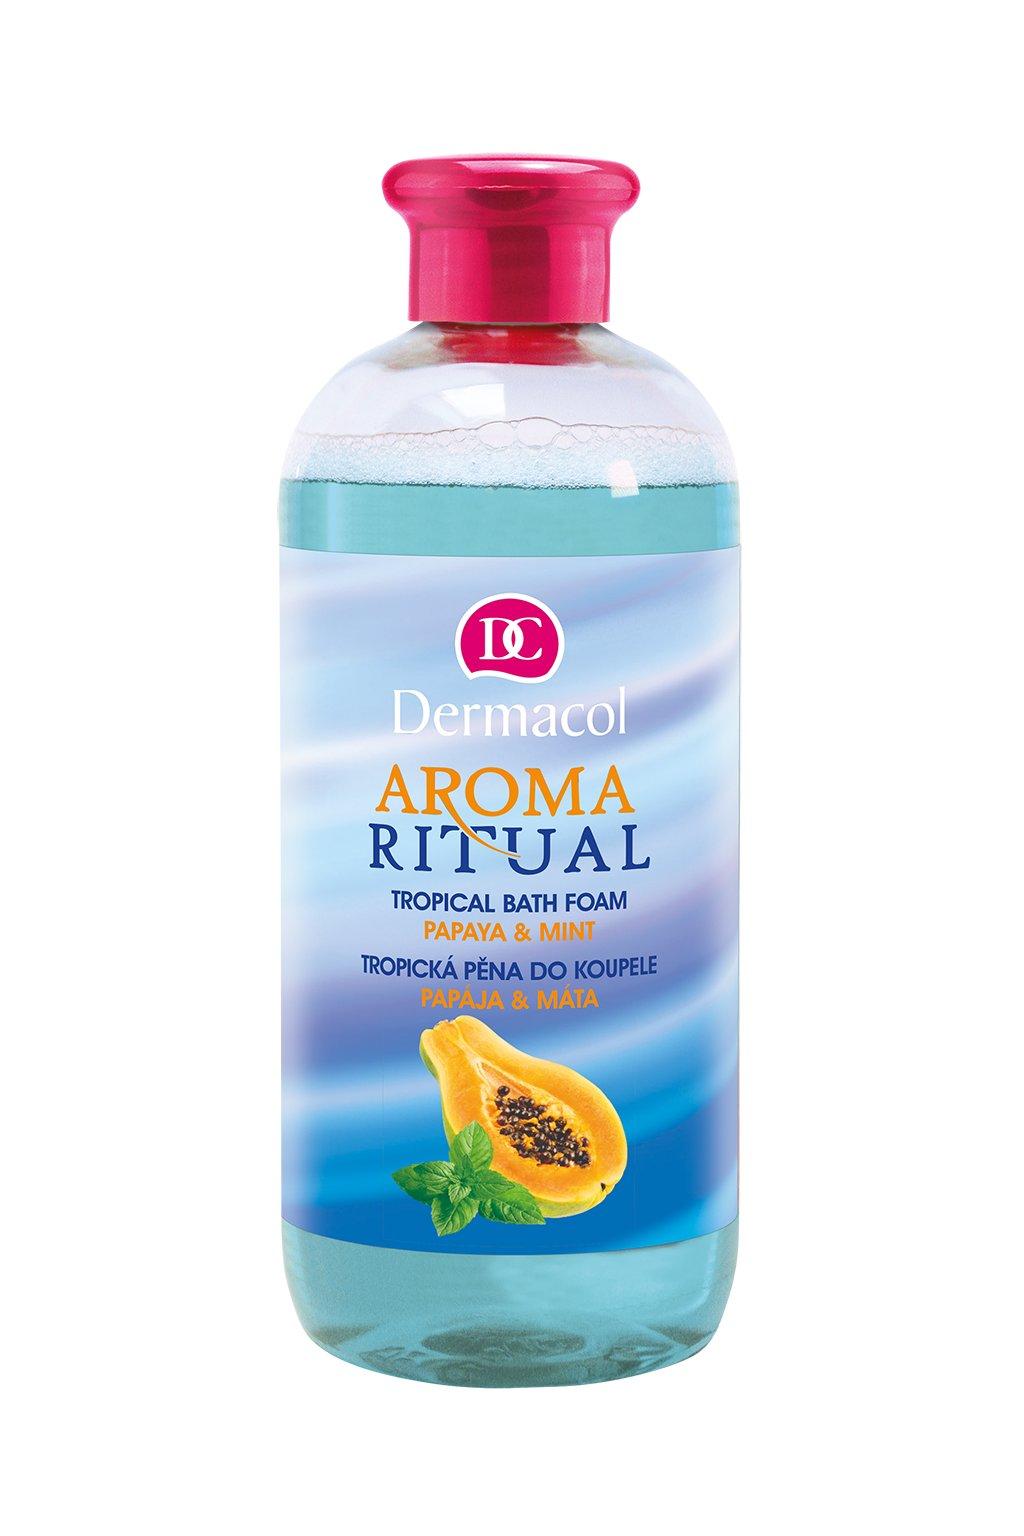 dermacol aroma ritual pena do koupele